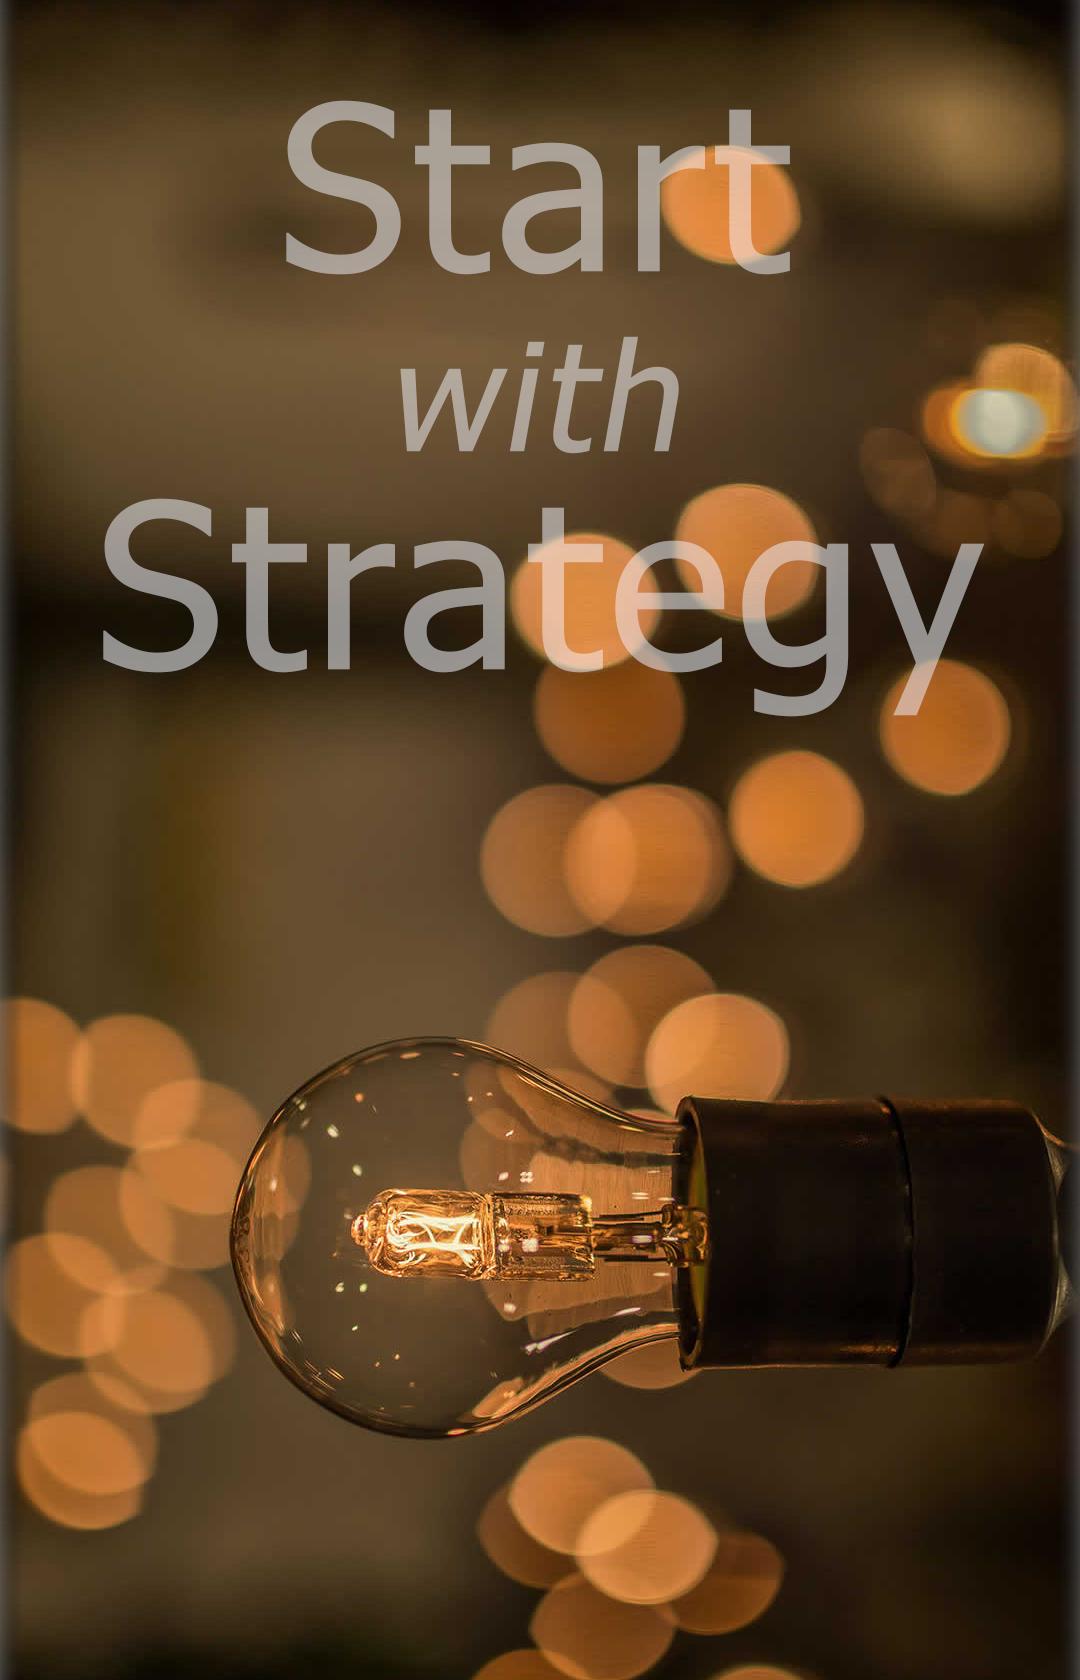 seo-strategy-image-mci